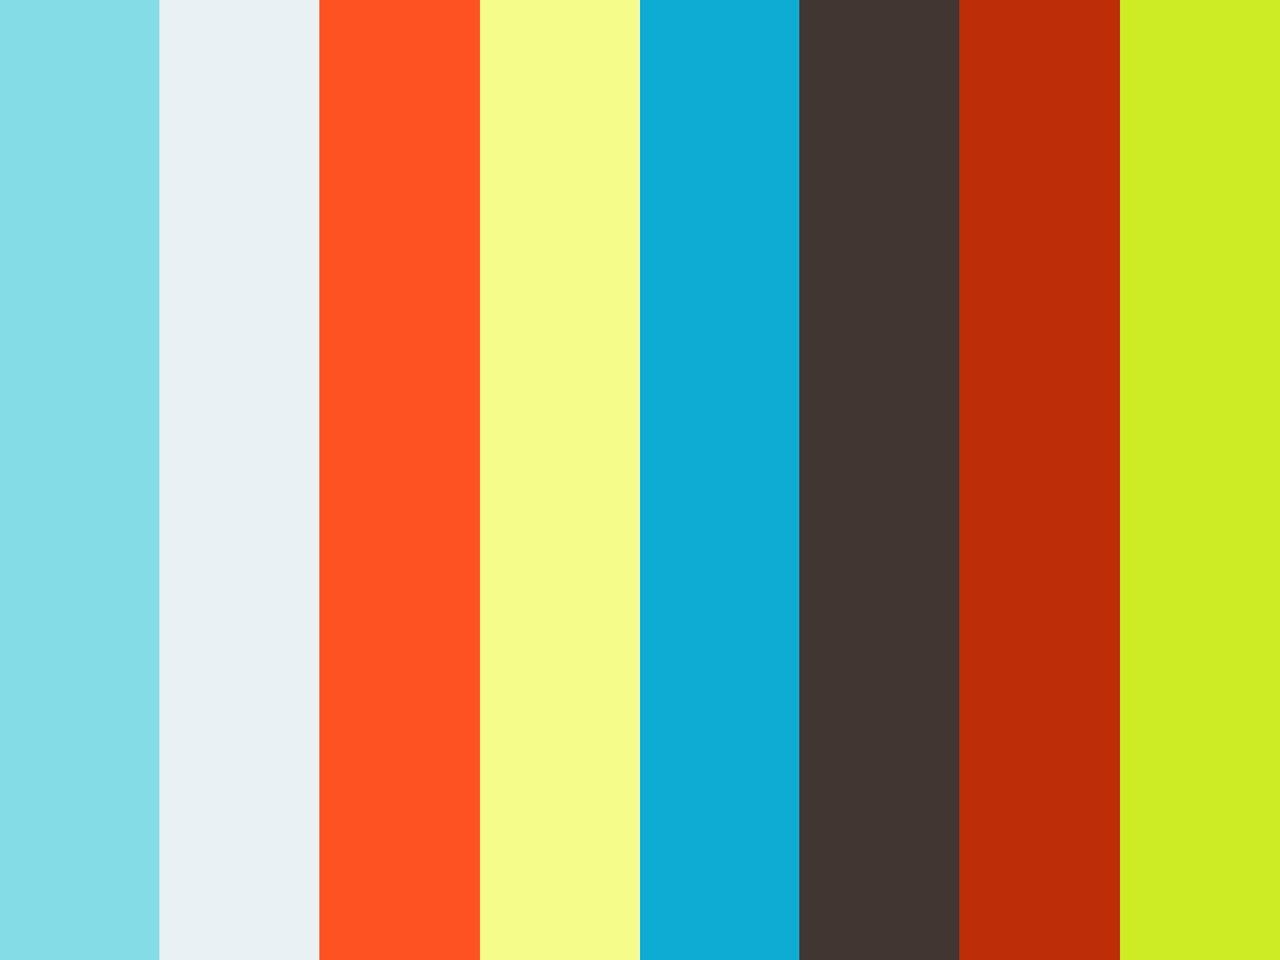 Molokai Covid19 Update - Tuesday, May 12, 2020